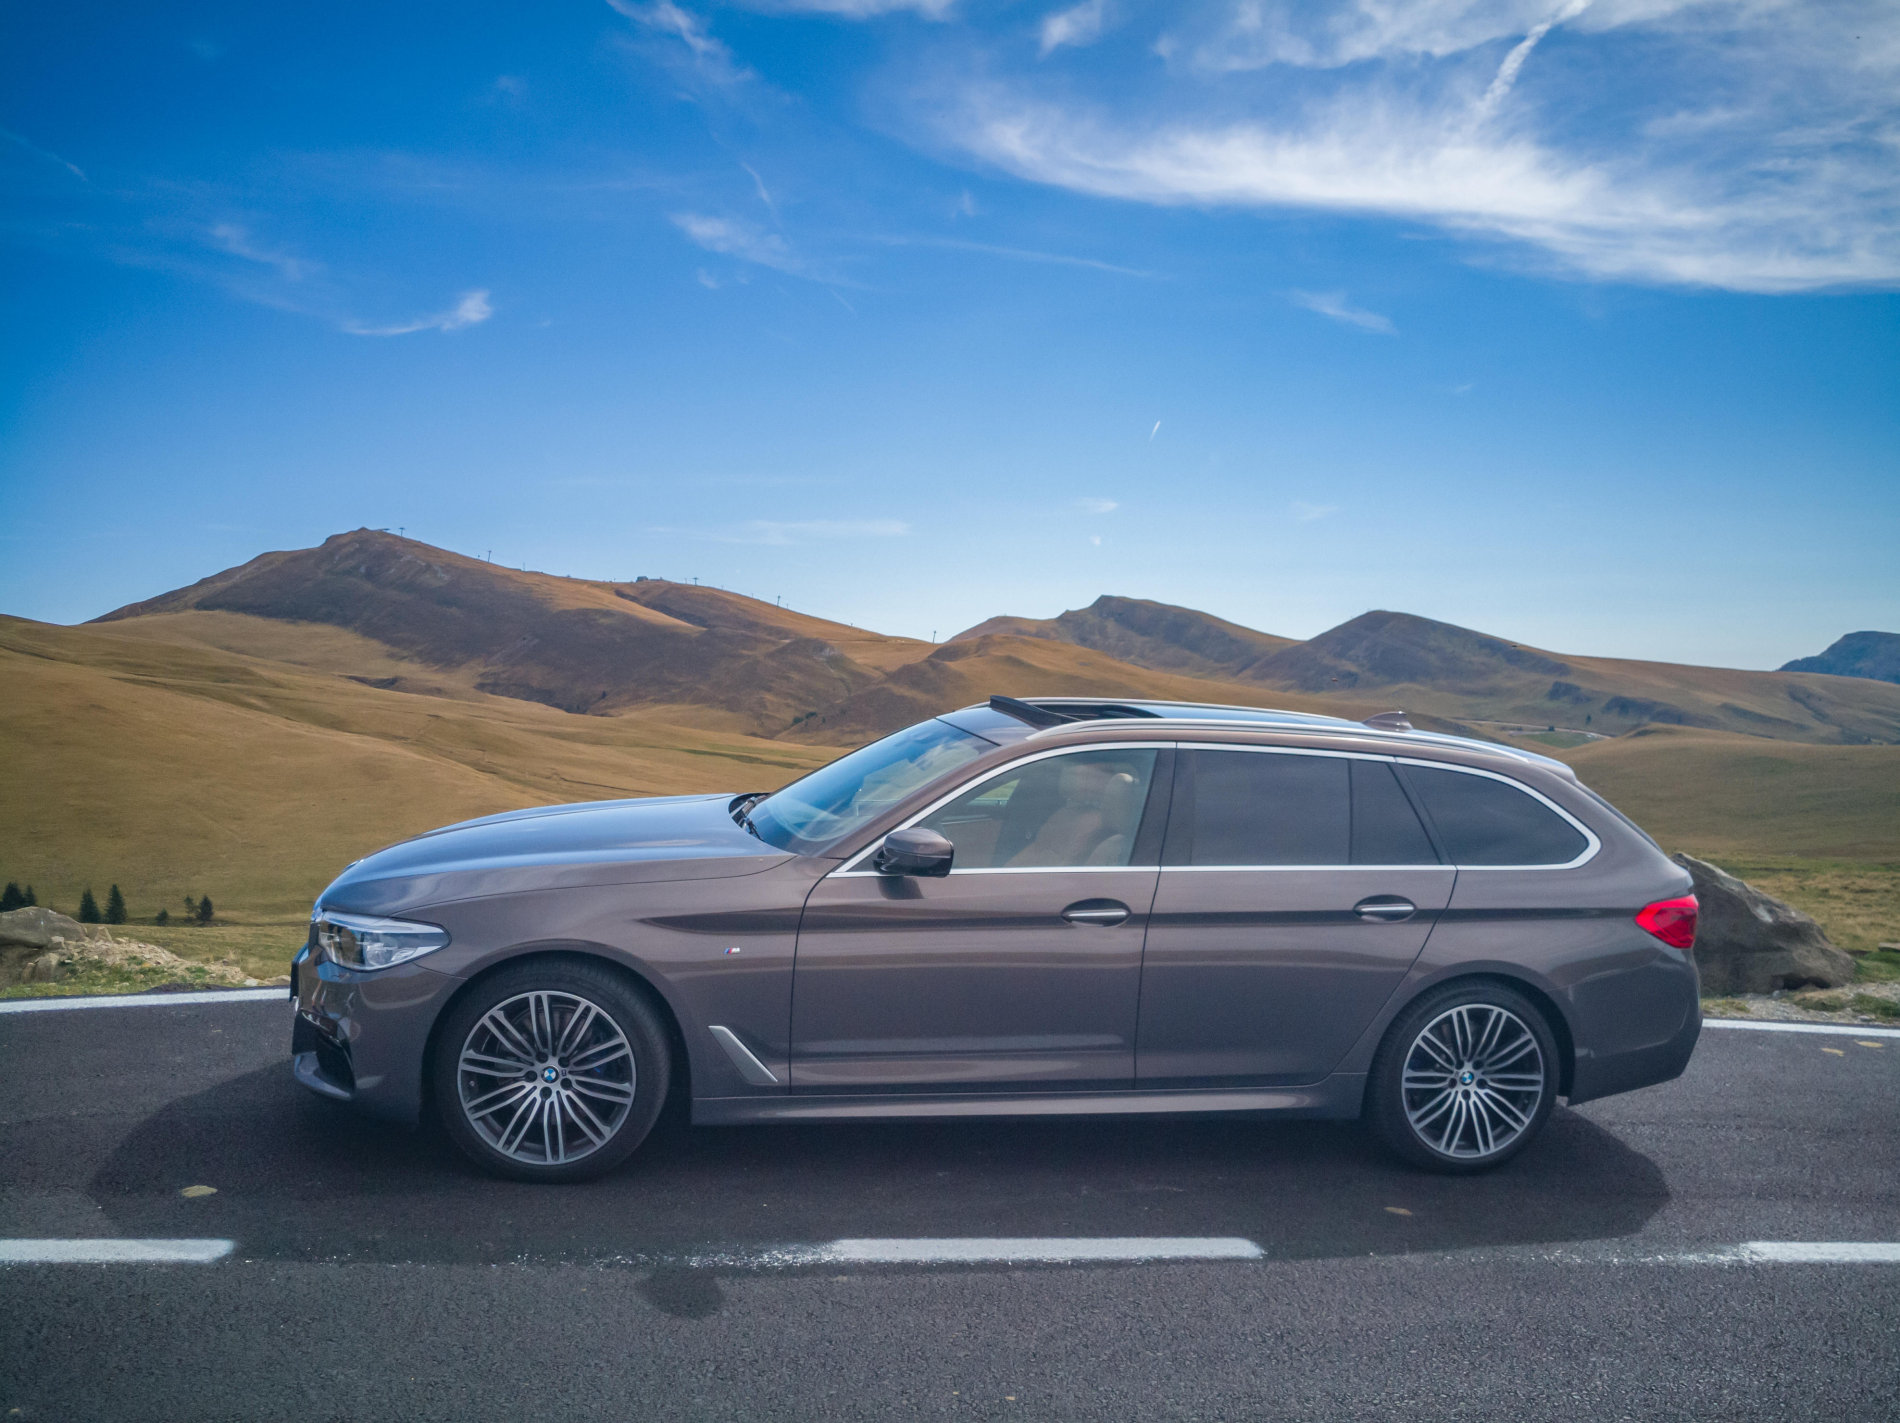 BMW 530d Touring - BMW 530d Touring